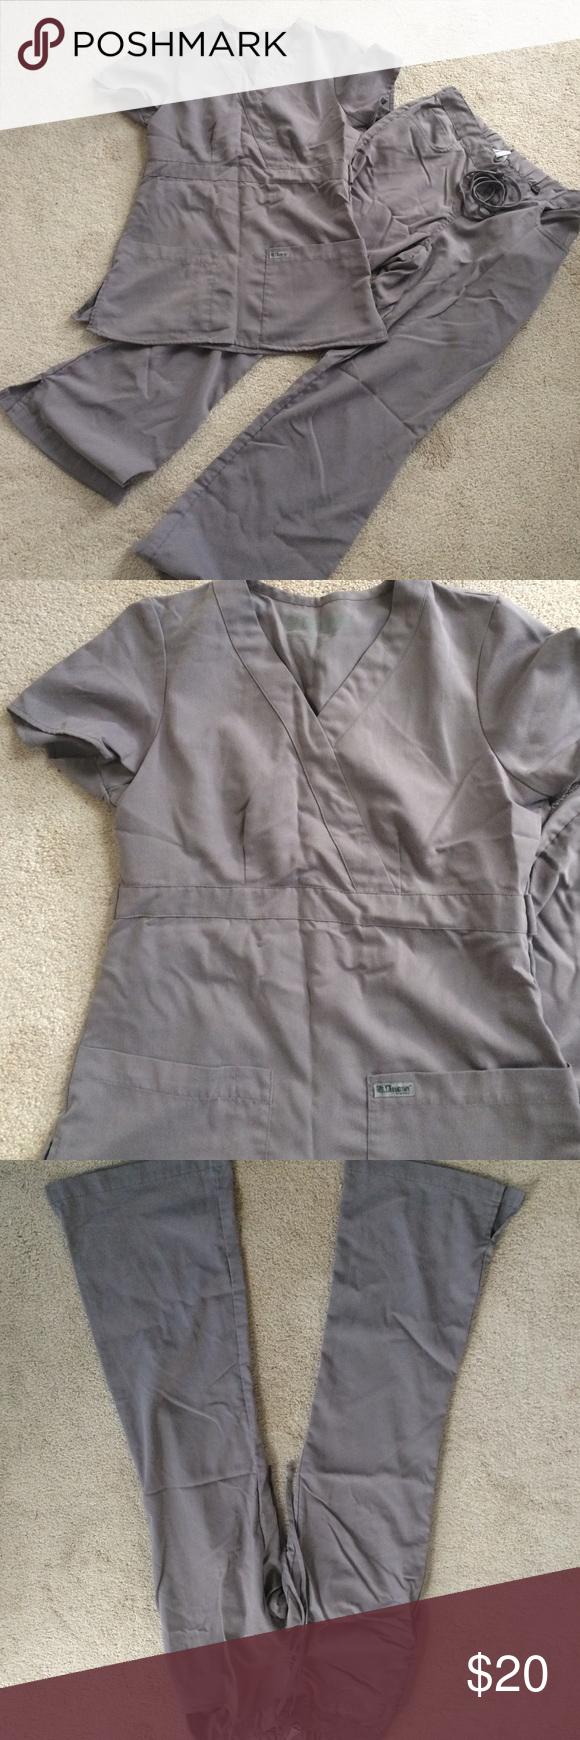 Gray's Anatomy Scrub Set- Gray Gray's Anatomy 2 piece scrub set size XS classic top, size XS petite 5 pocket flare leg pants, in perfect condition Gray's Anatomy Other